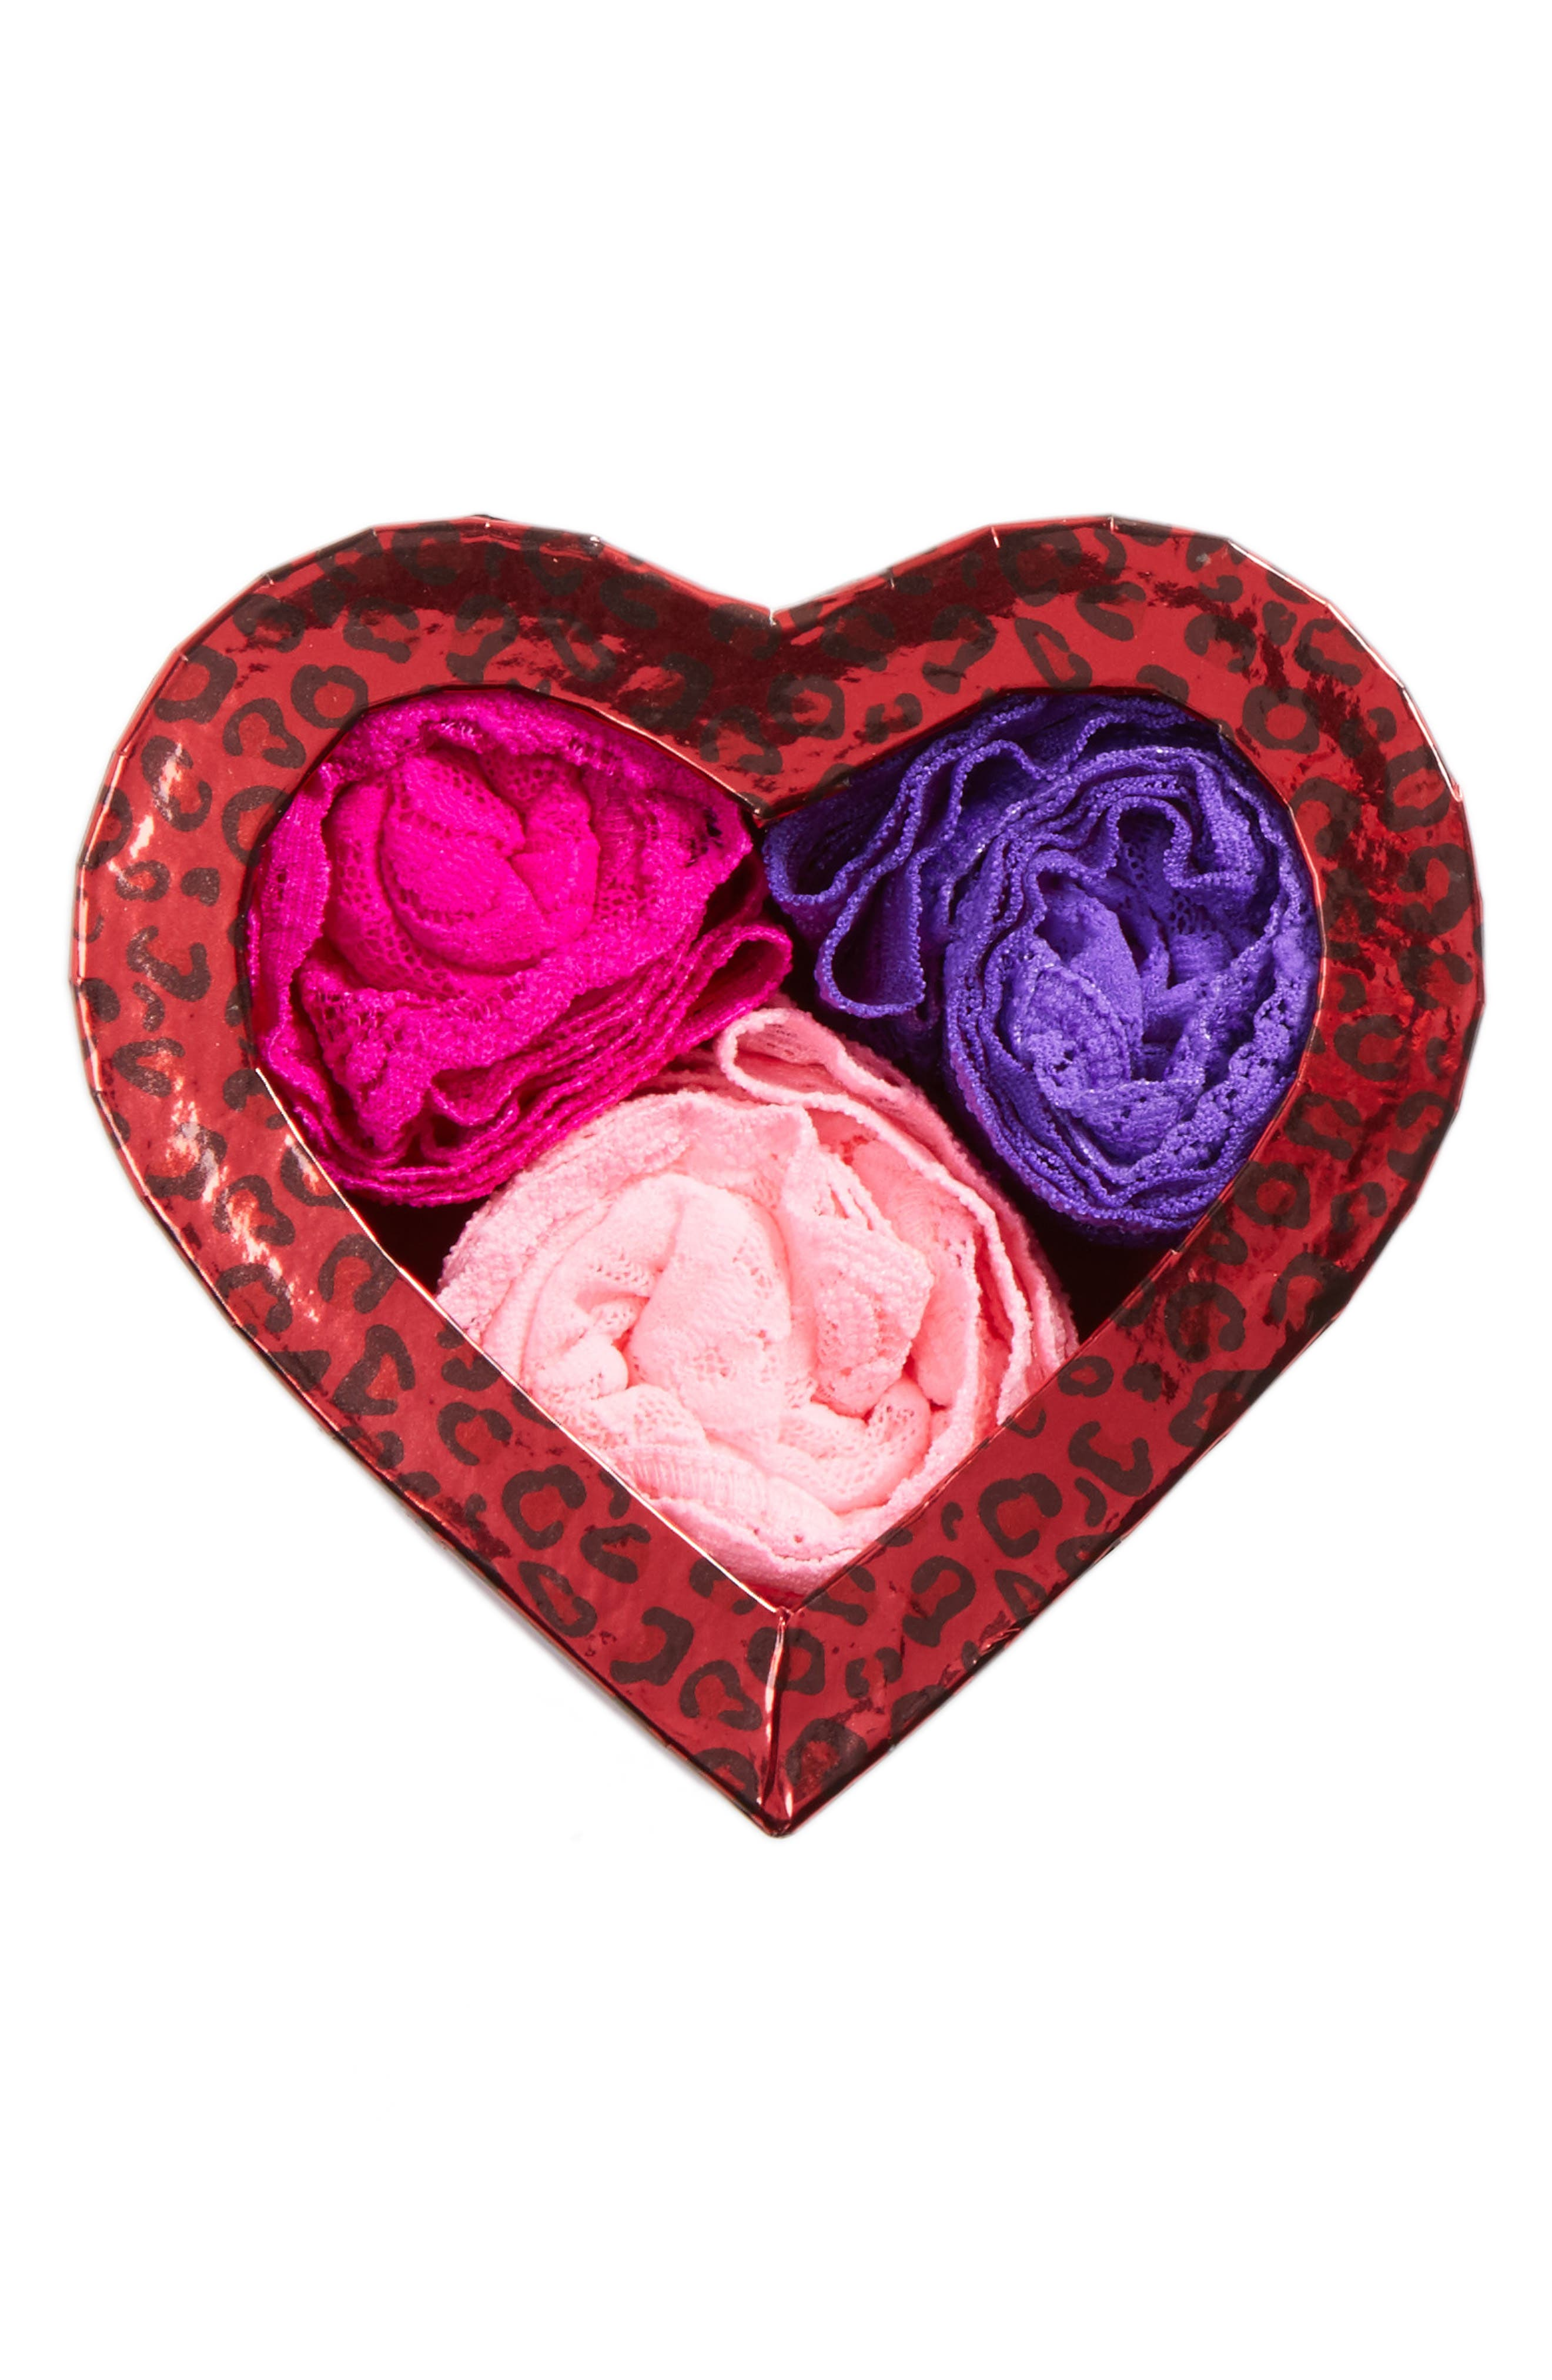 'Hugs N Kisses' Boxed Original Rise Thongs (3-Pack),                         Main,                         color, Cherry Blossom/ Royal